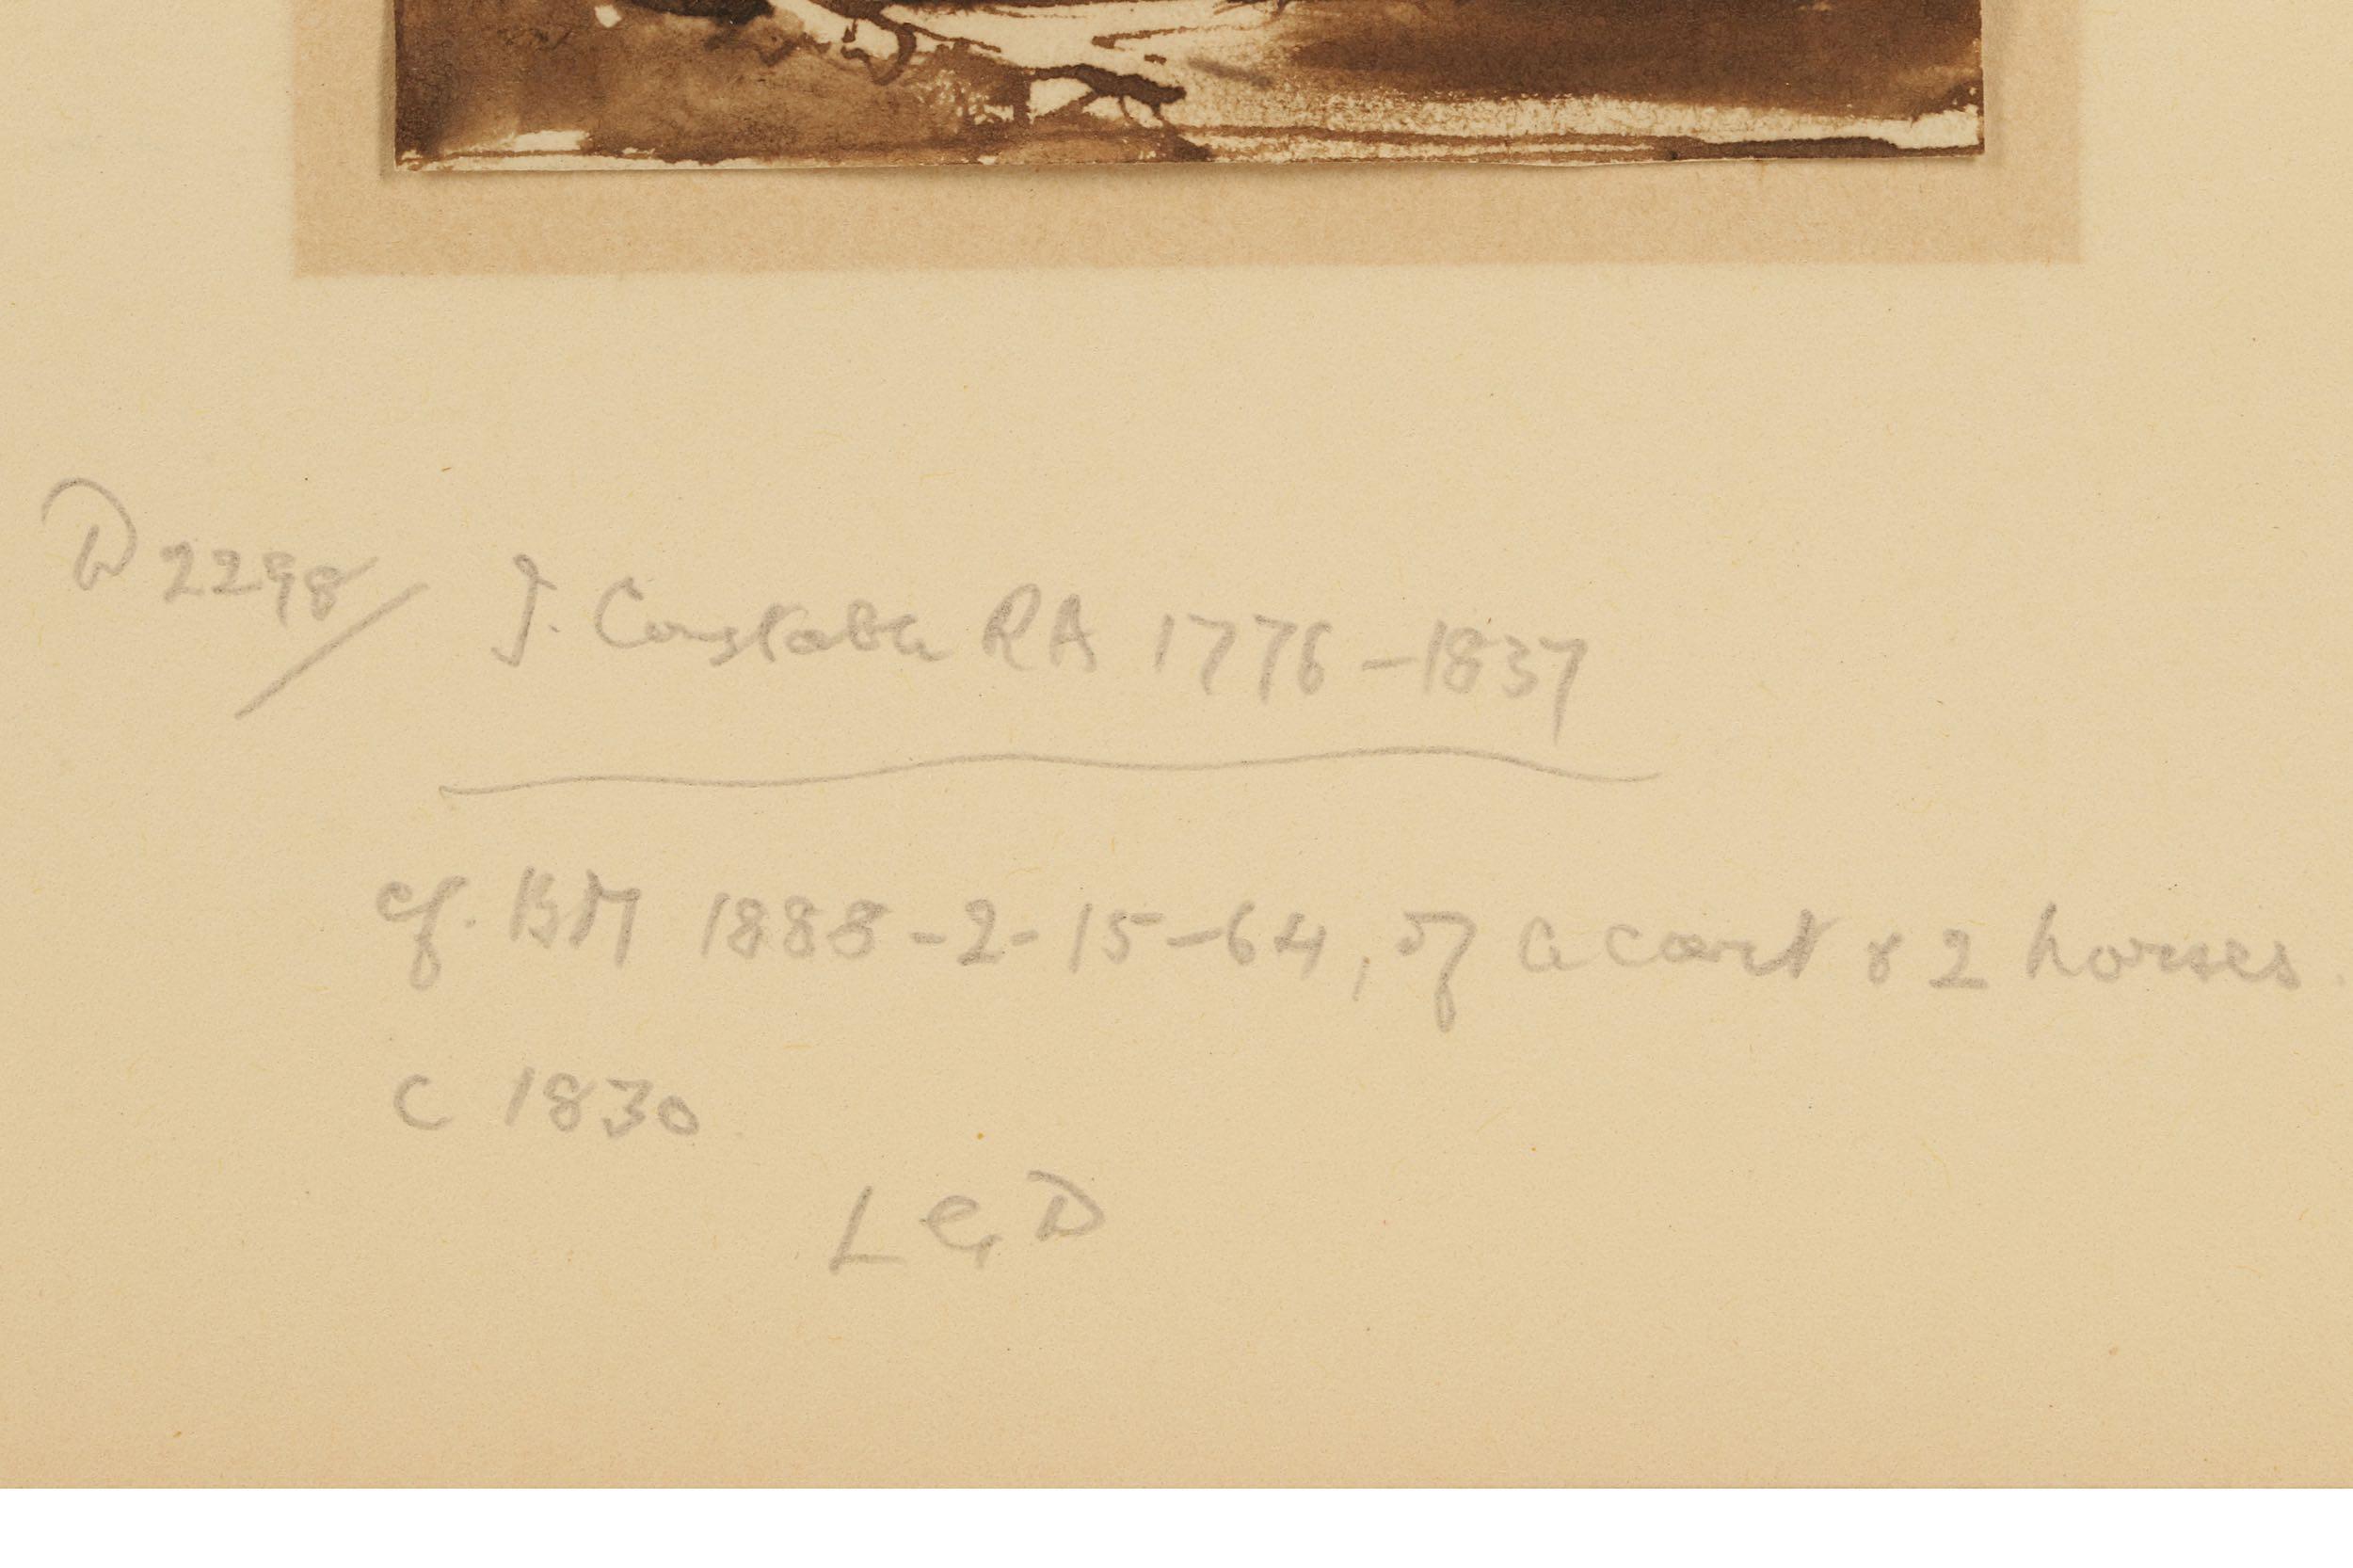 JOHN CONSTABLE RA (BRITISH 1776 -1837) - Image 3 of 7